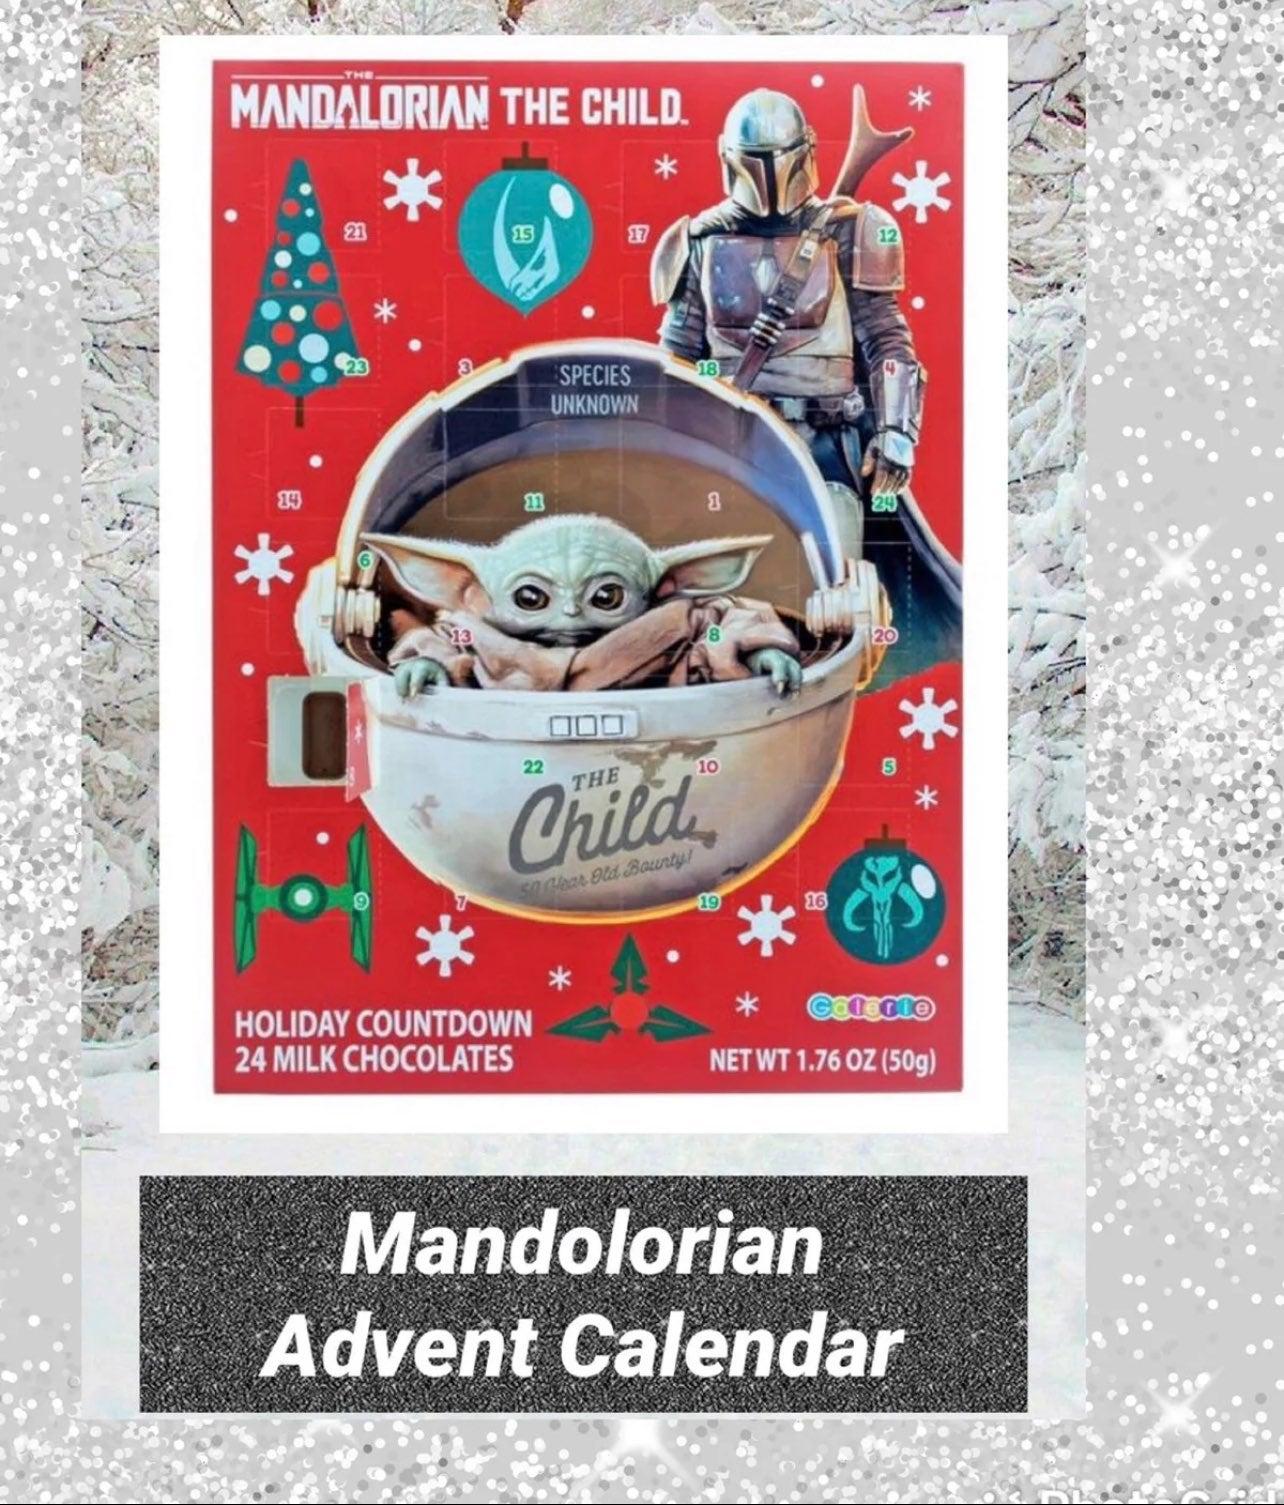 Mandolorian Advent Calender